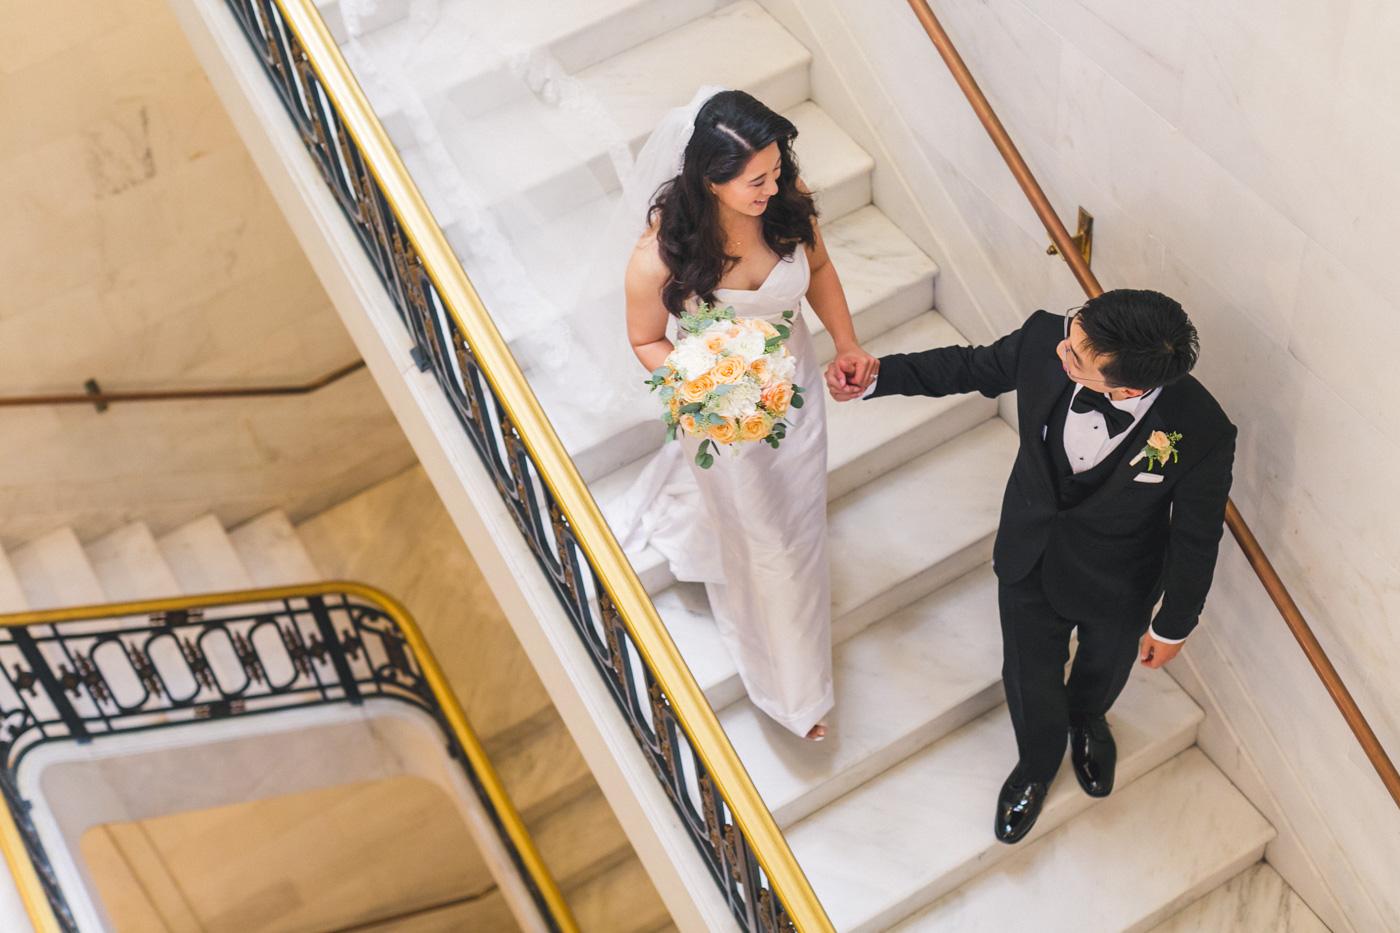 bride-and-groom-walking-down-stairs